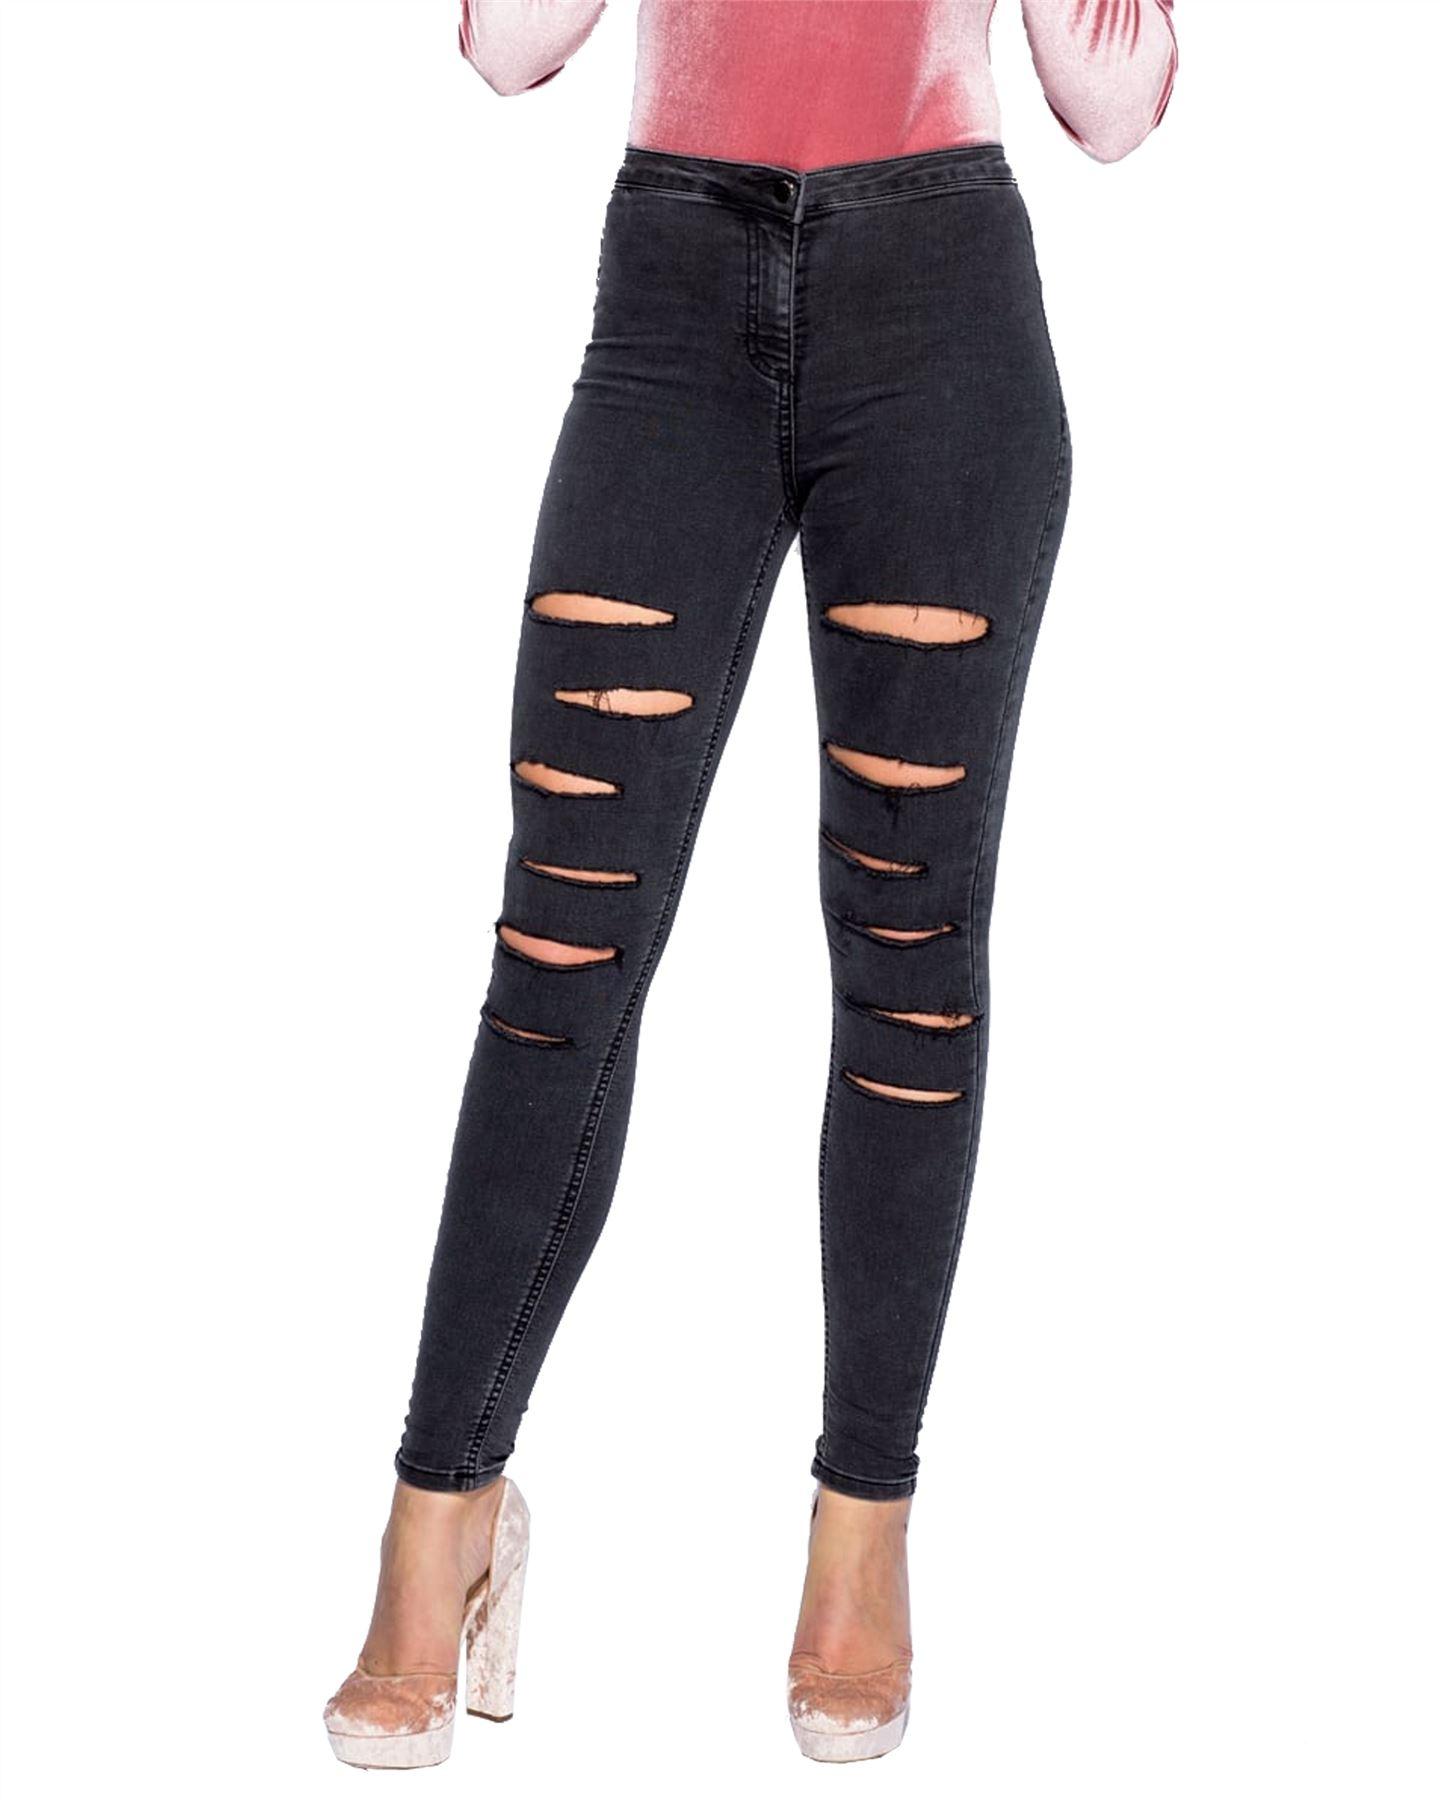 New Ladies Women Faded Ripped Denim Multi Slash Skinny Stretchy Jeans Jeggings